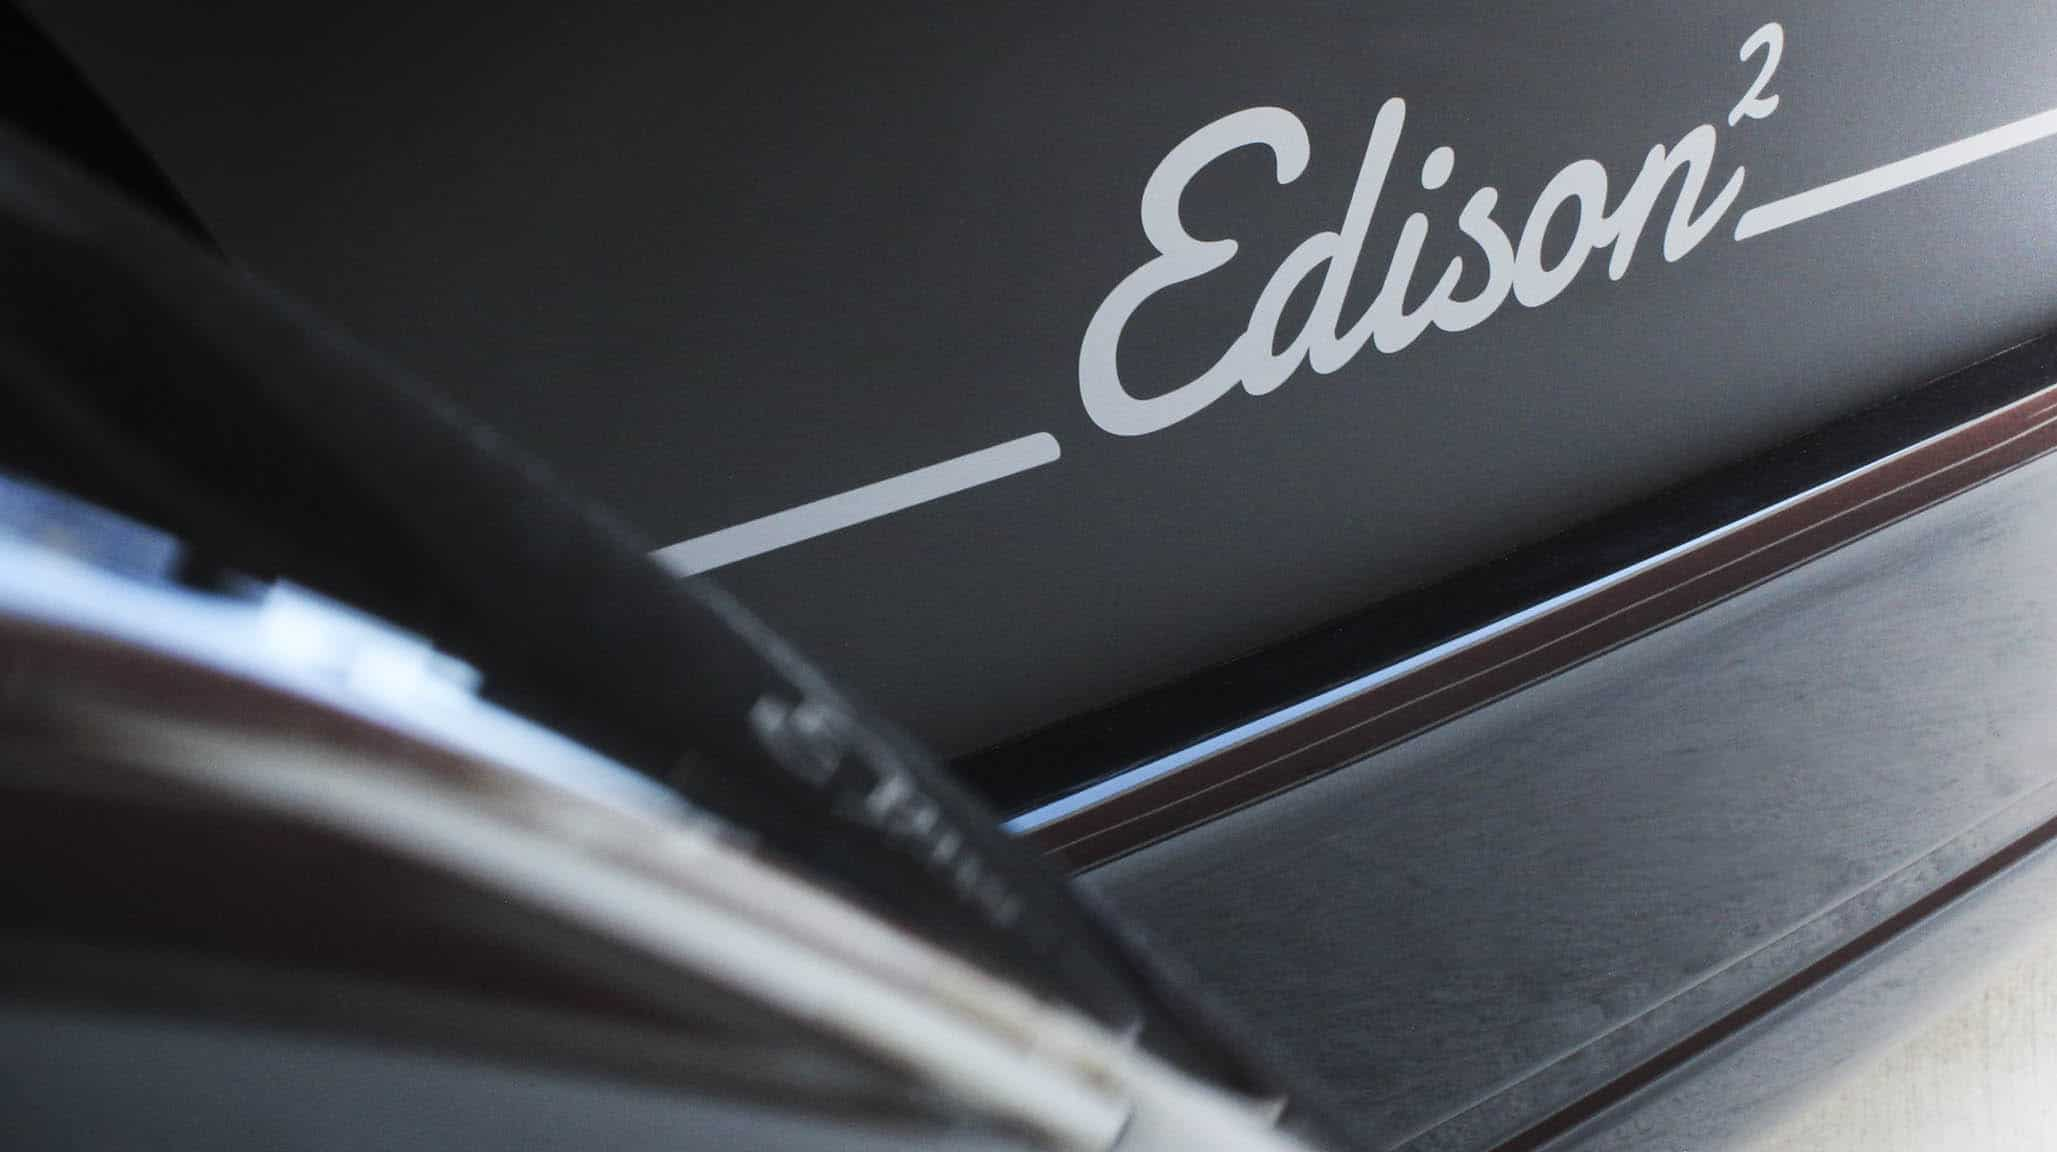 Edison 2 gallery pic 6